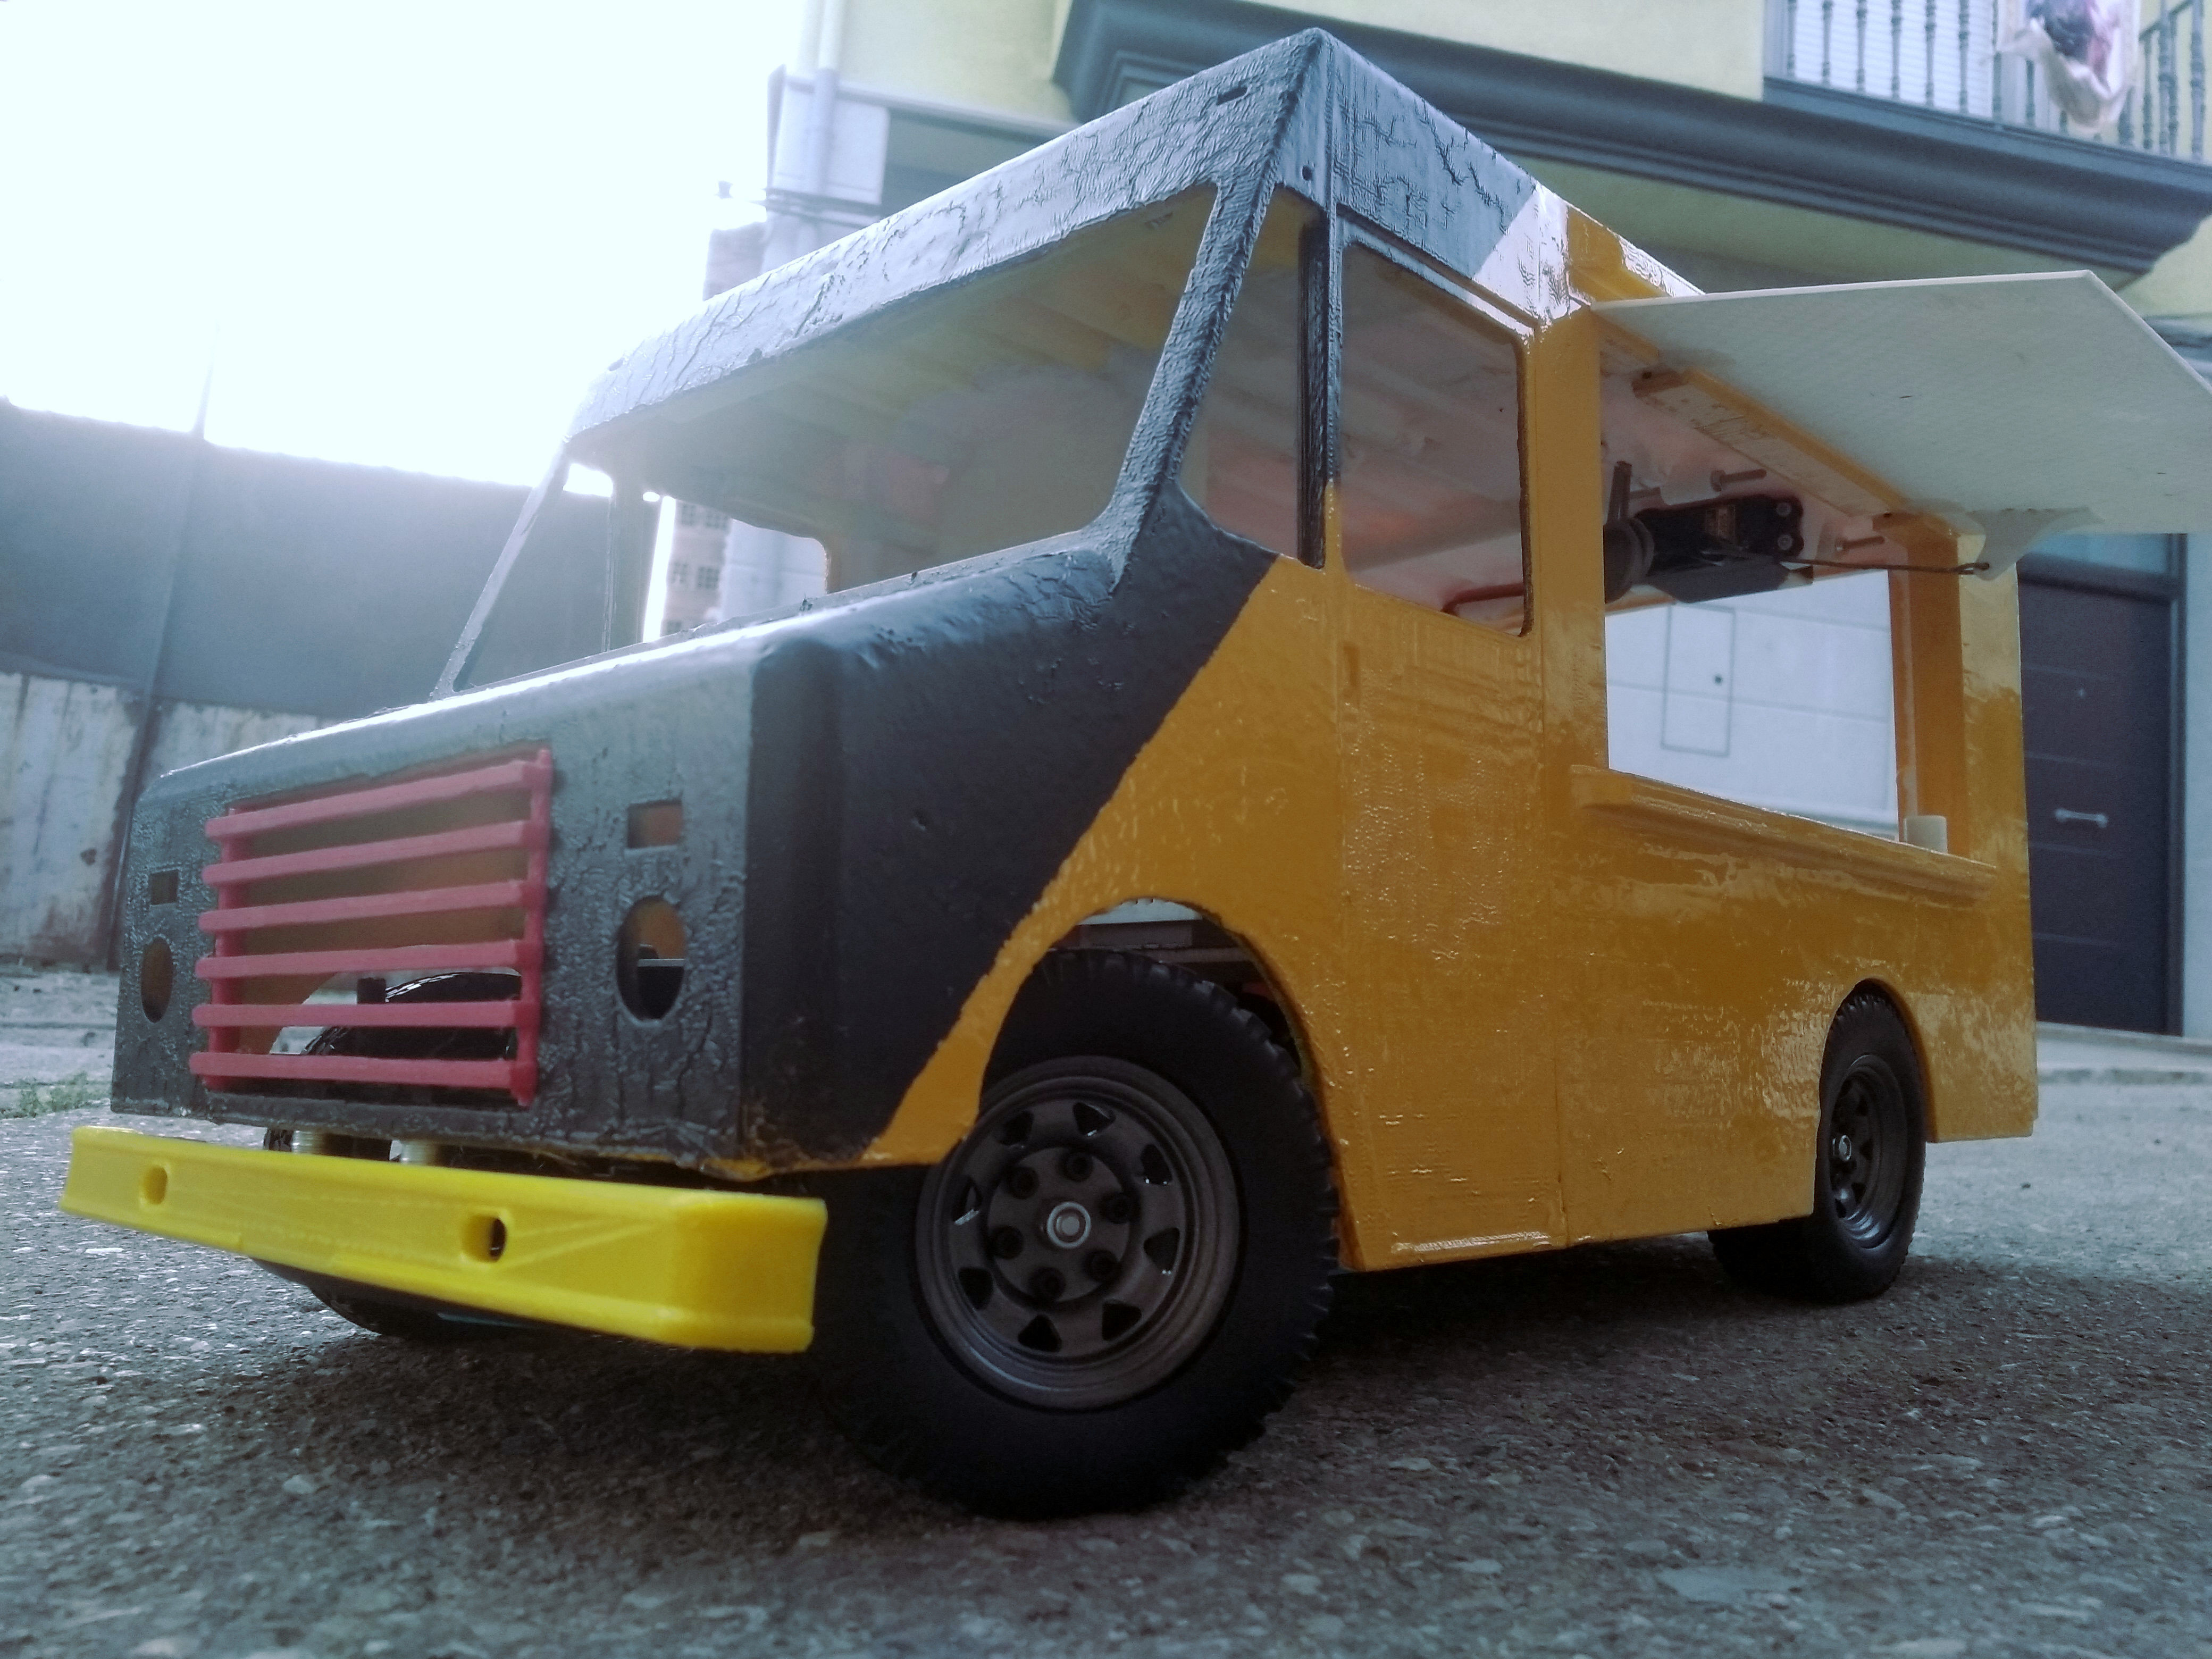 RC fast food drift rally trail crawler truck